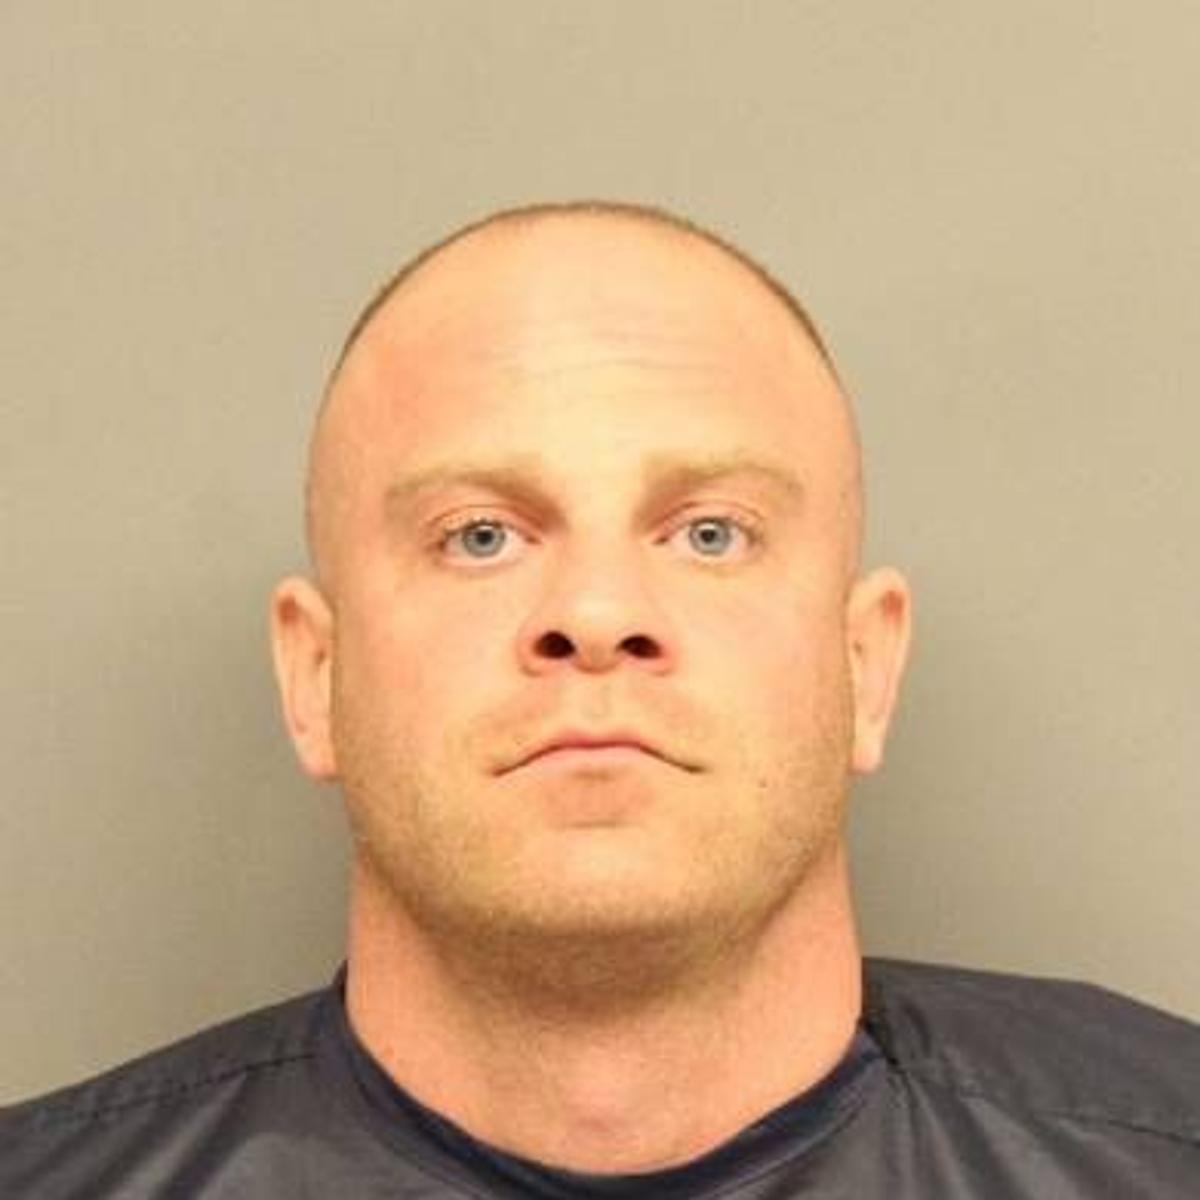 Deputies bag $500,000 in suspected drug money, sheriff says | Crime